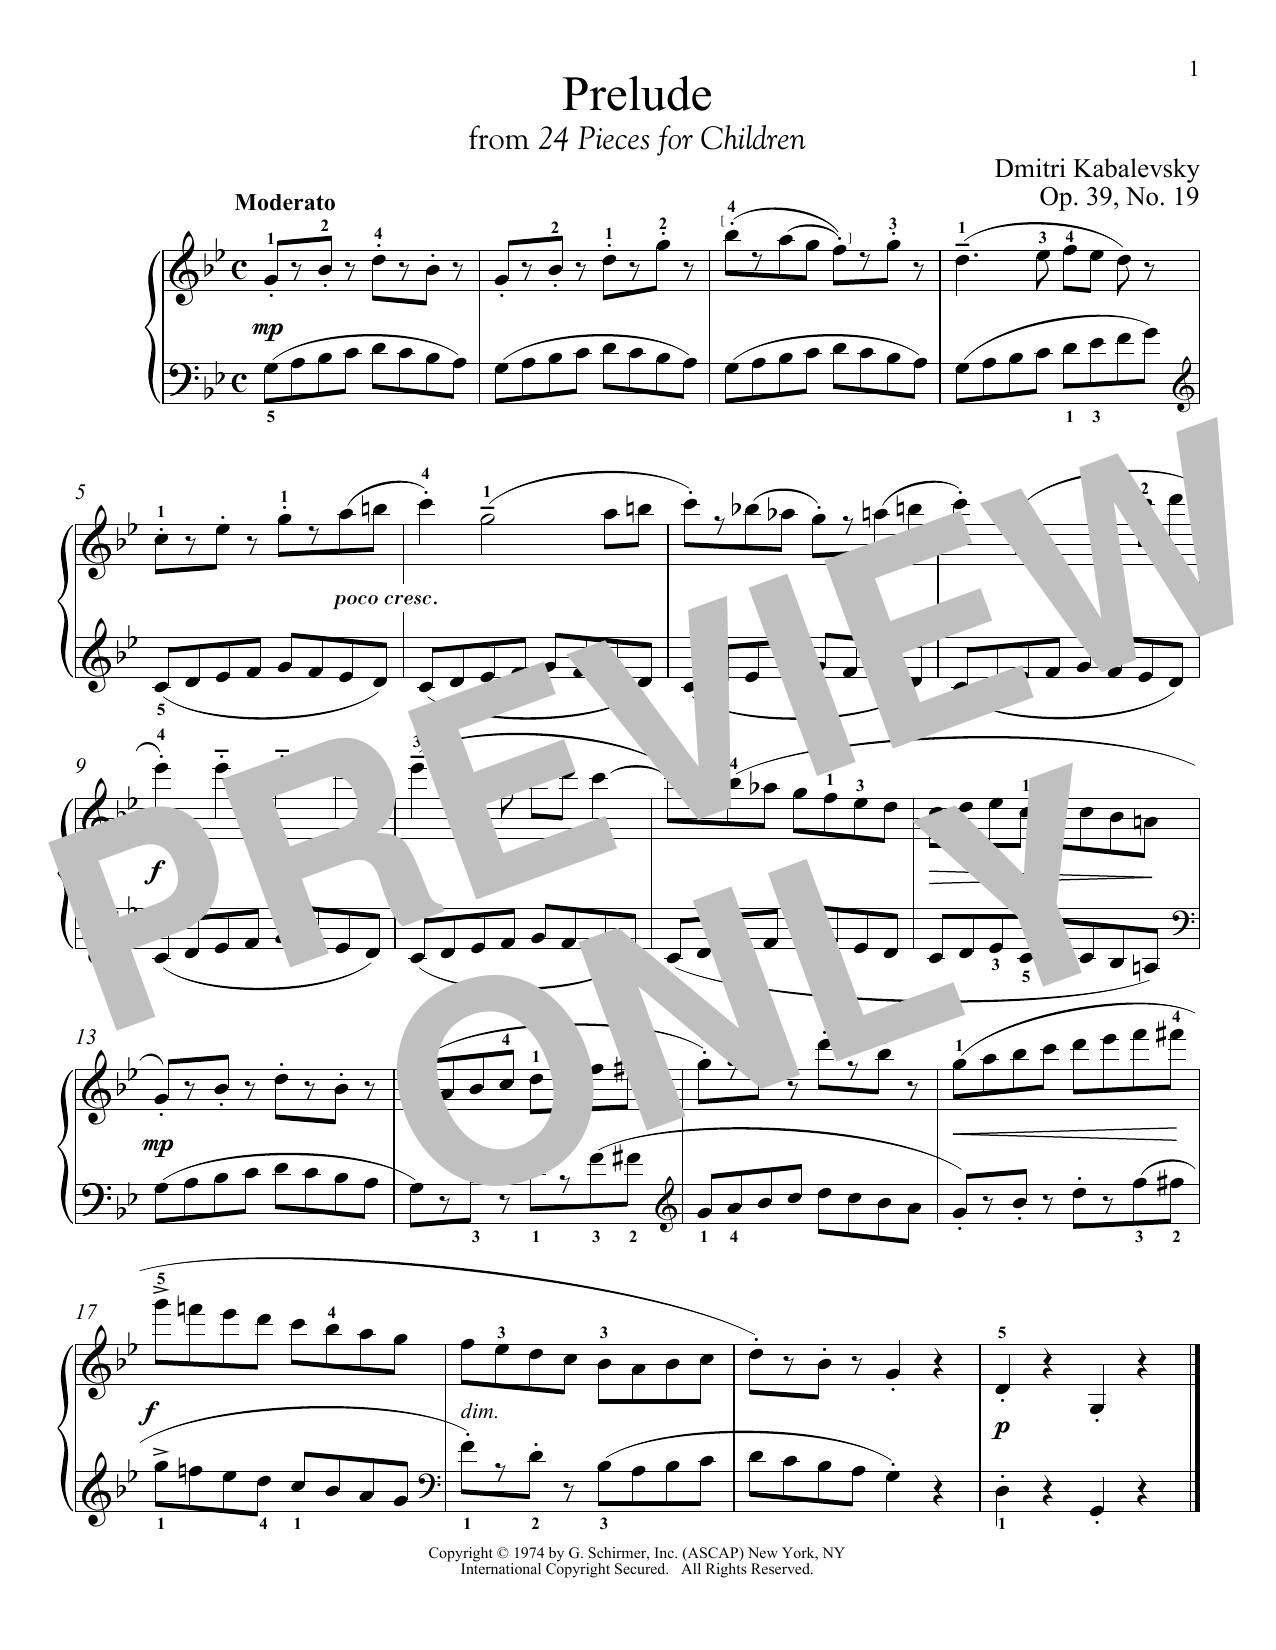 Prelude, Op. 39, No. 19 (Piano Solo)